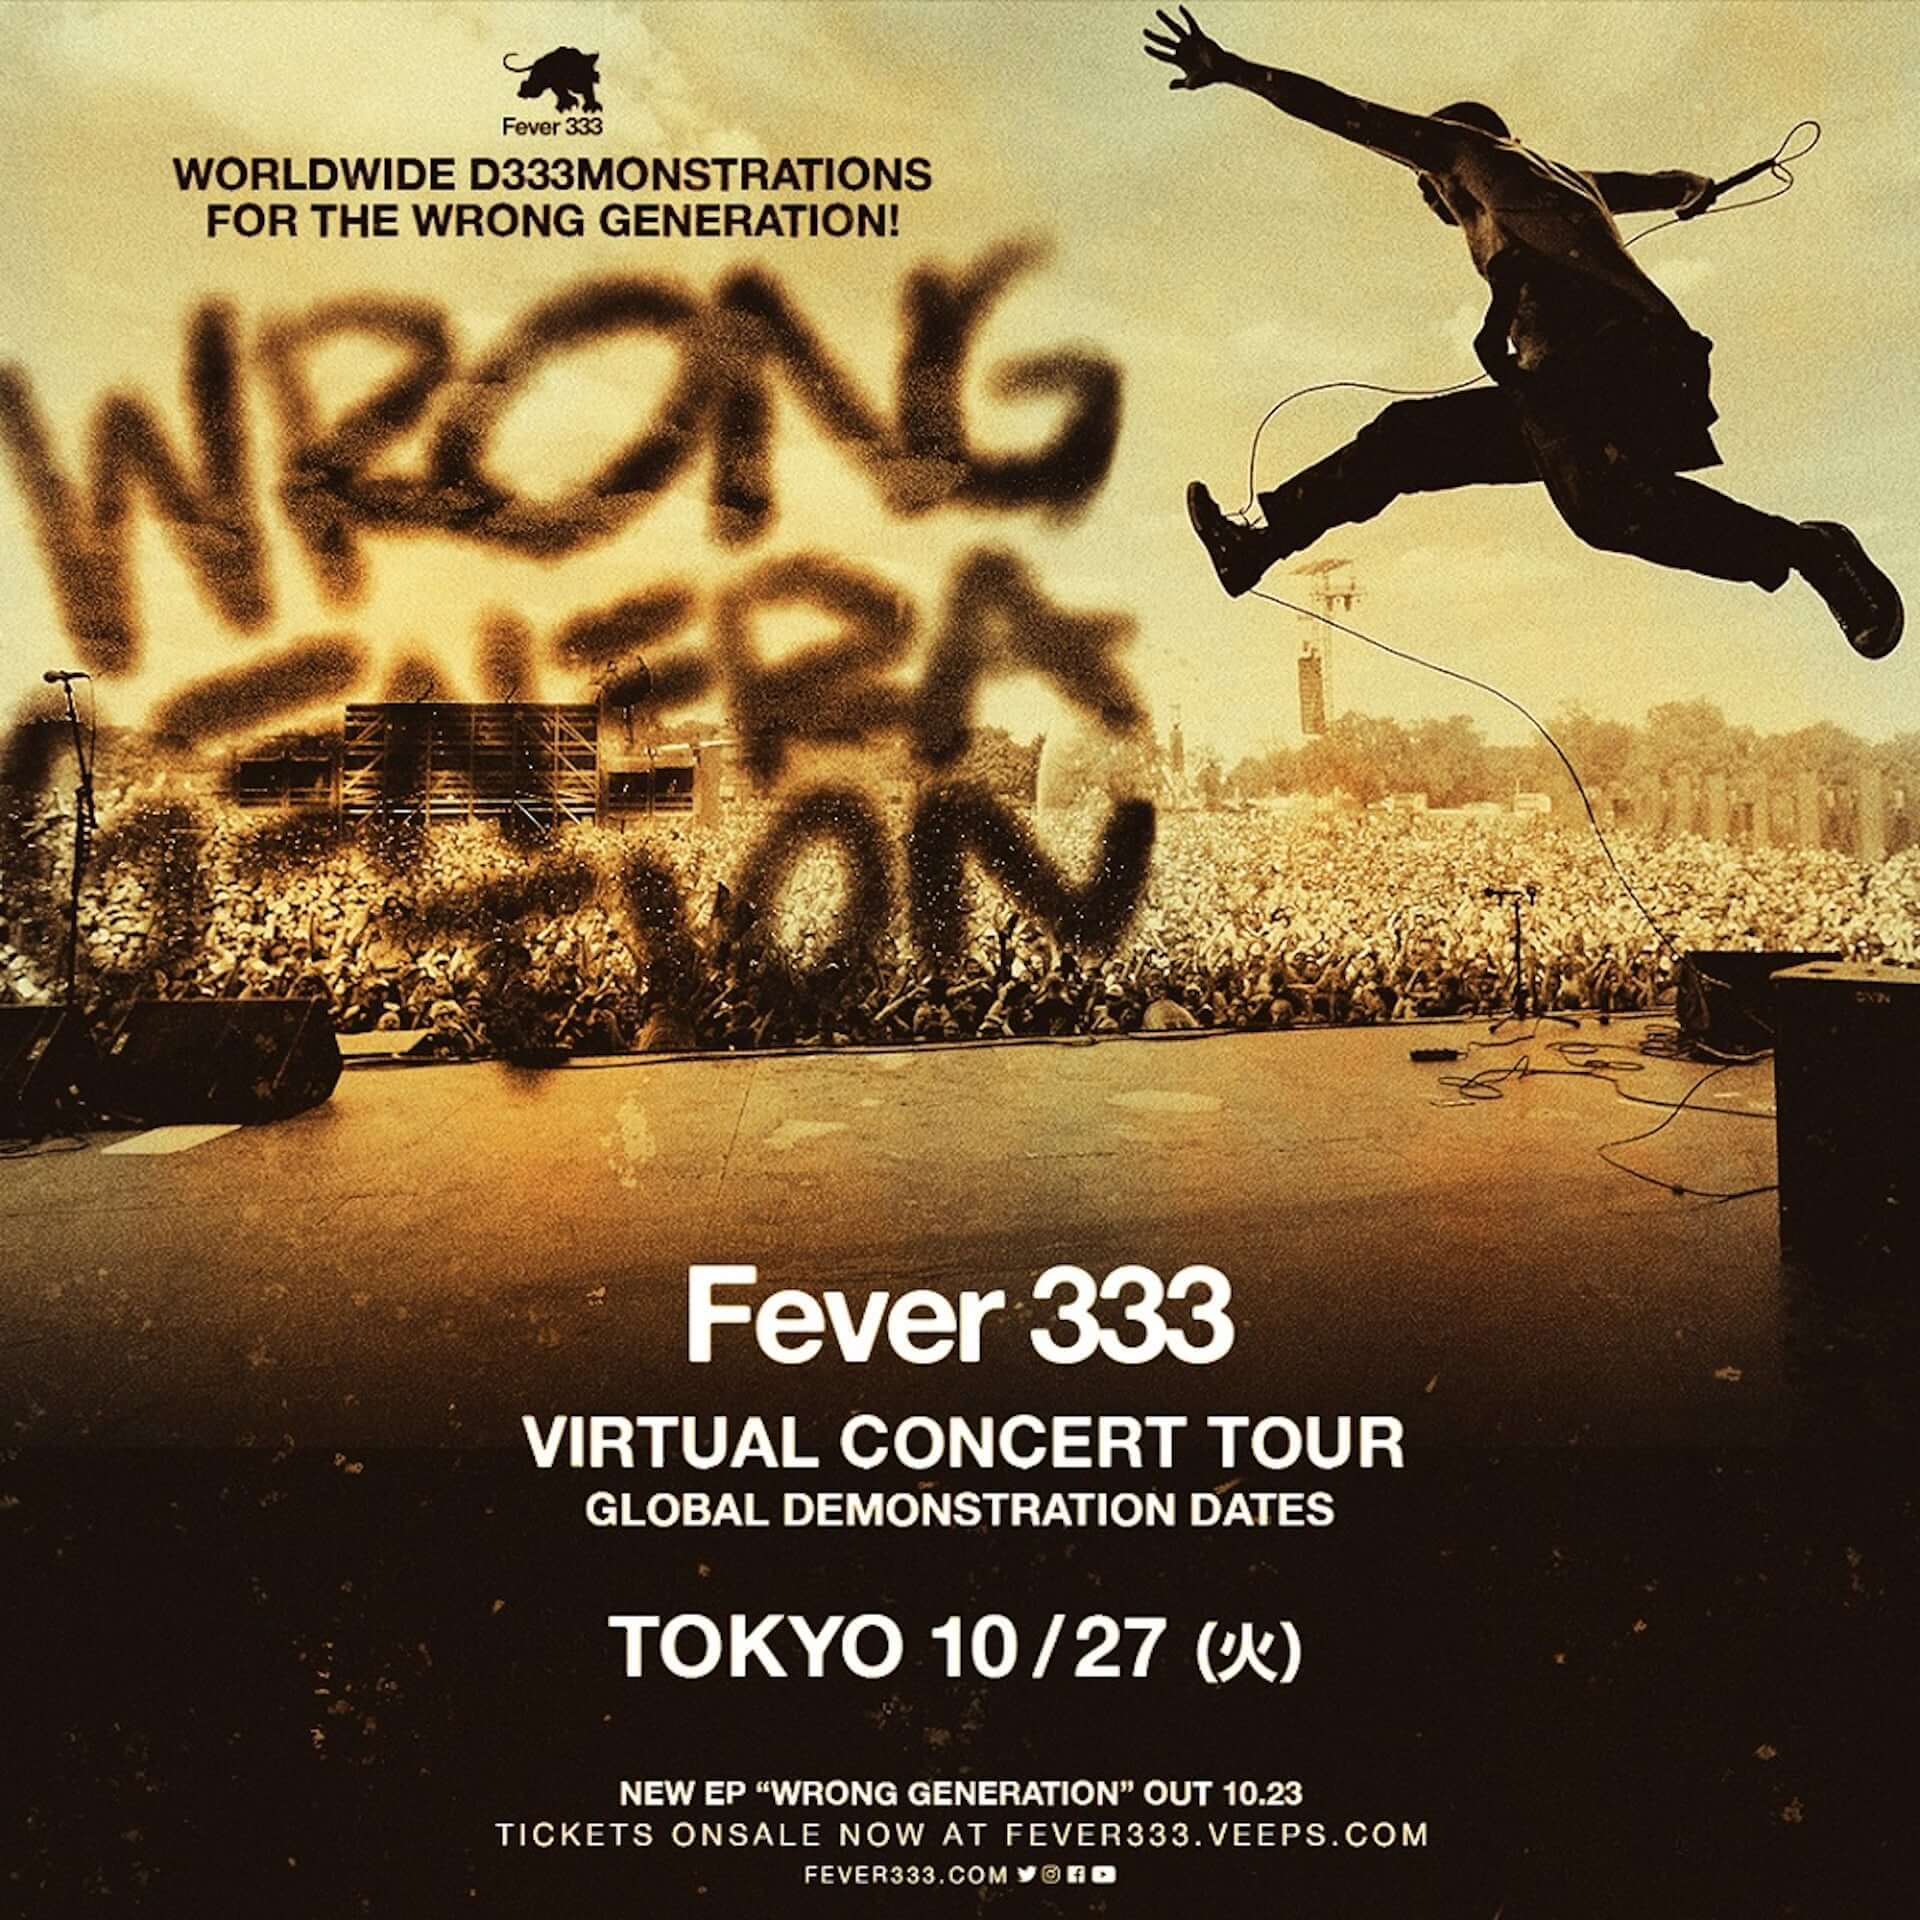 <FUJI ROCK FESTIVAL 2018>で初来日を果たしたFEVER 333が日本向けバーチャルライブツアーを明日開催!最新EPも配信中 music201026_fever333_2-1920x1920